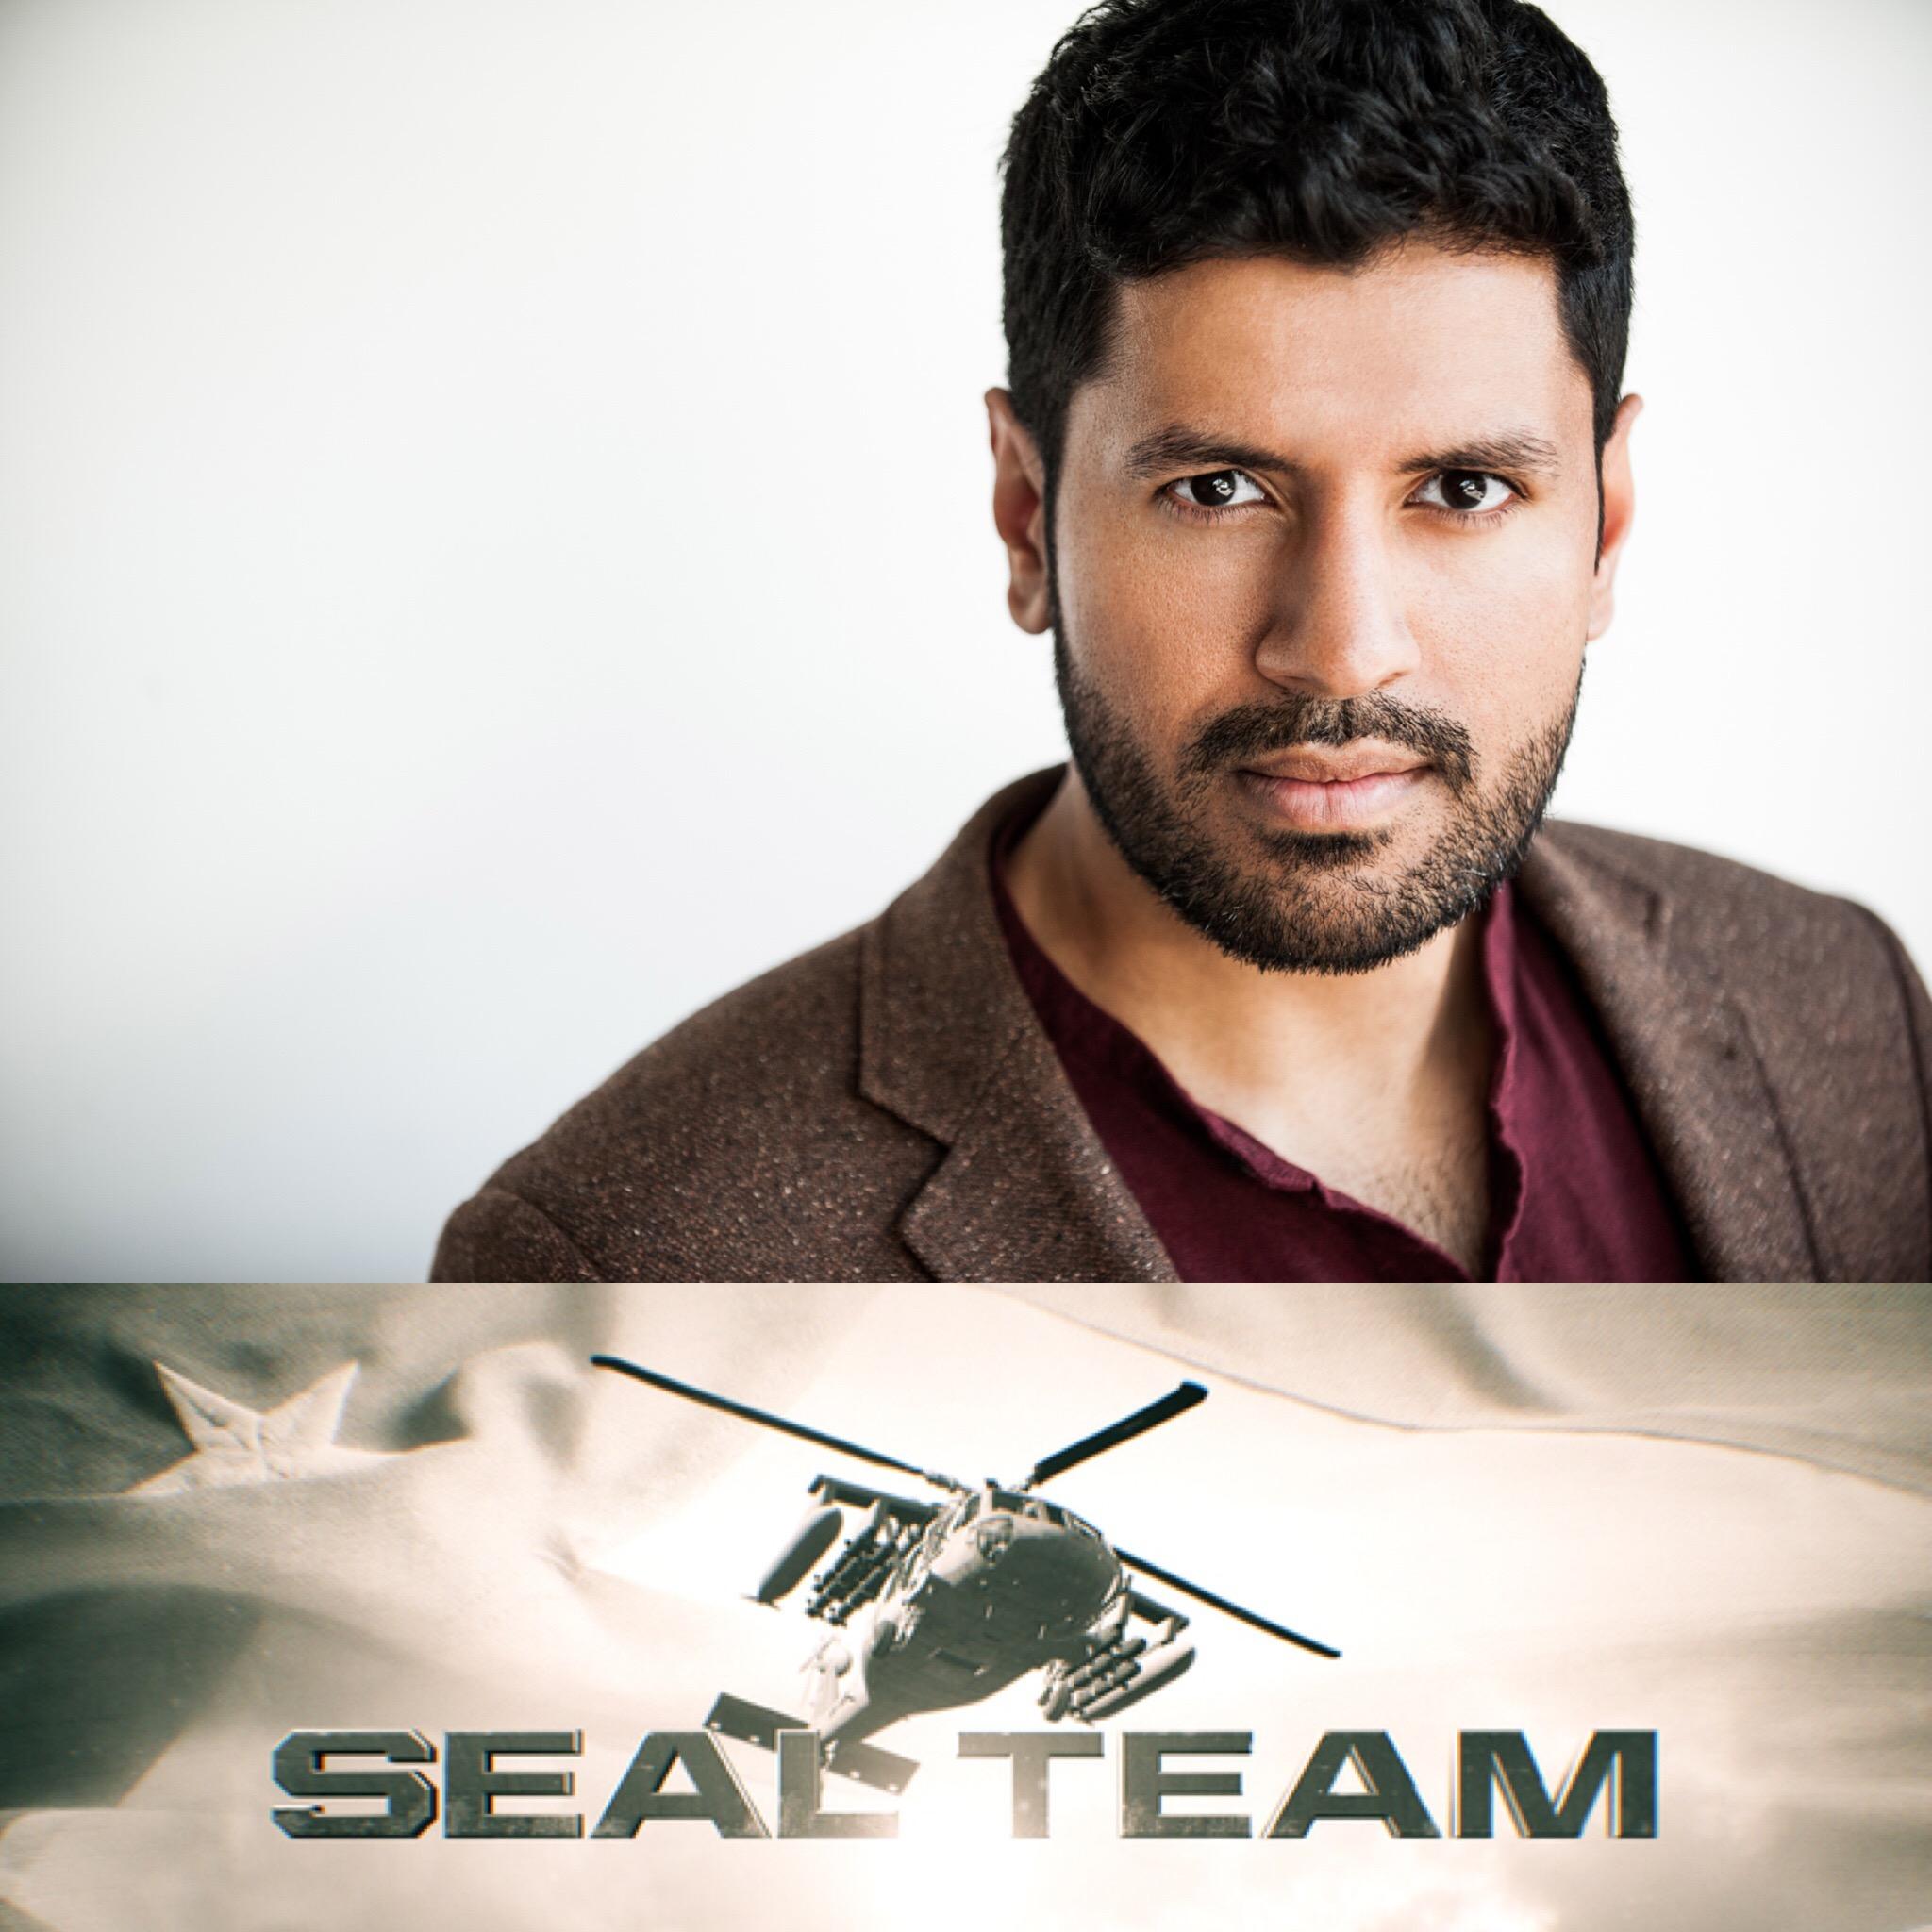 Seal Team (Promotional).JPG